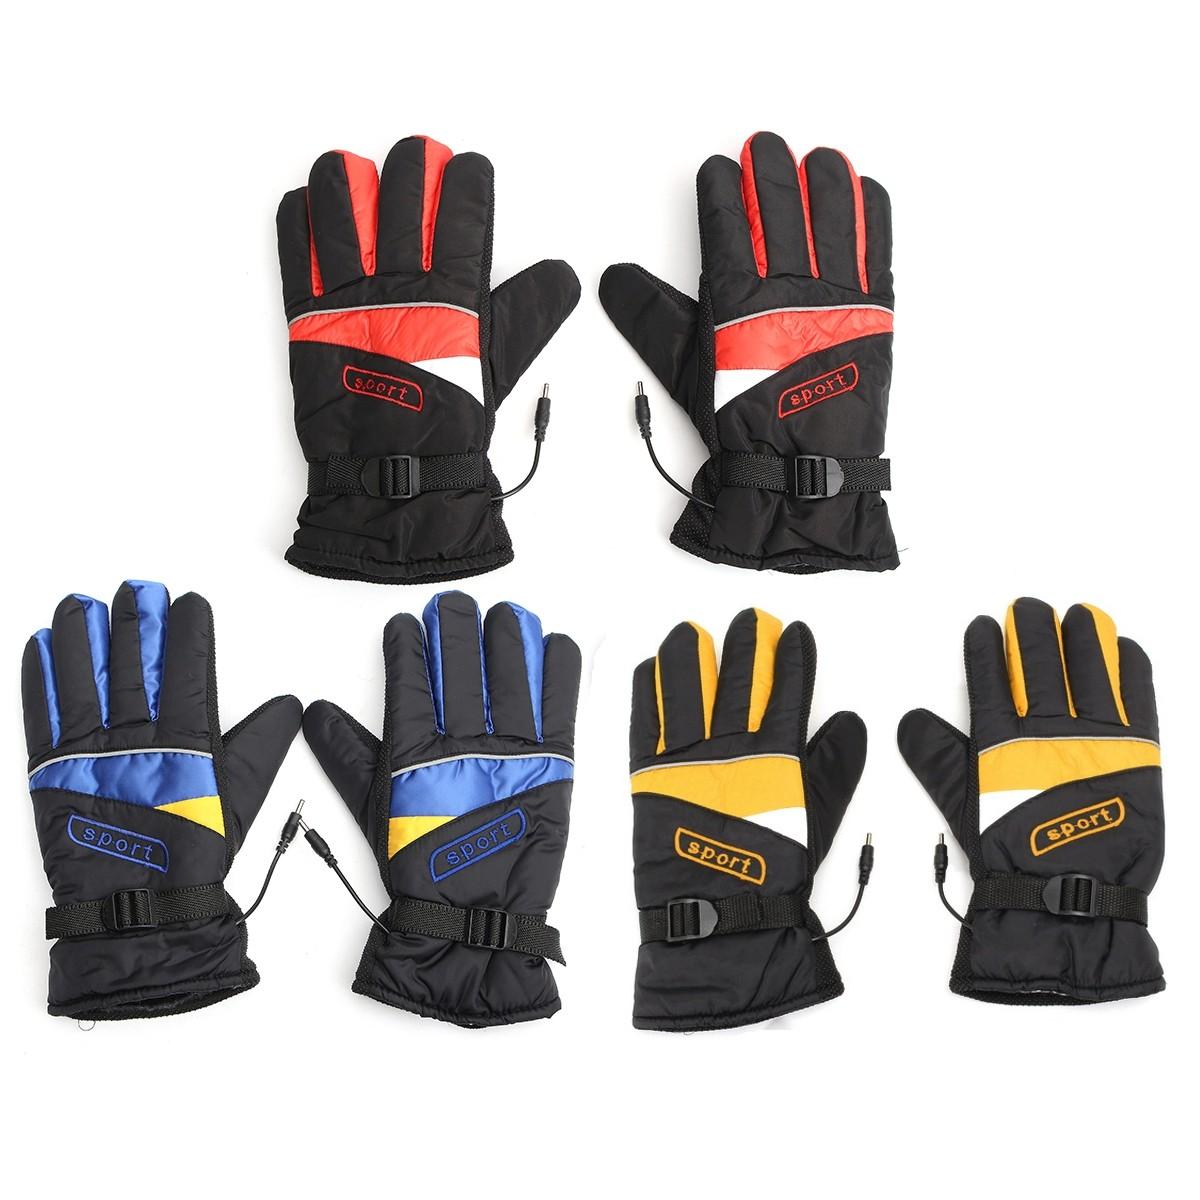 Buy 12V/48V/60V Waterproof Electric Heated Gloves Winter Inner Warmer Motorcycle Ski Racing